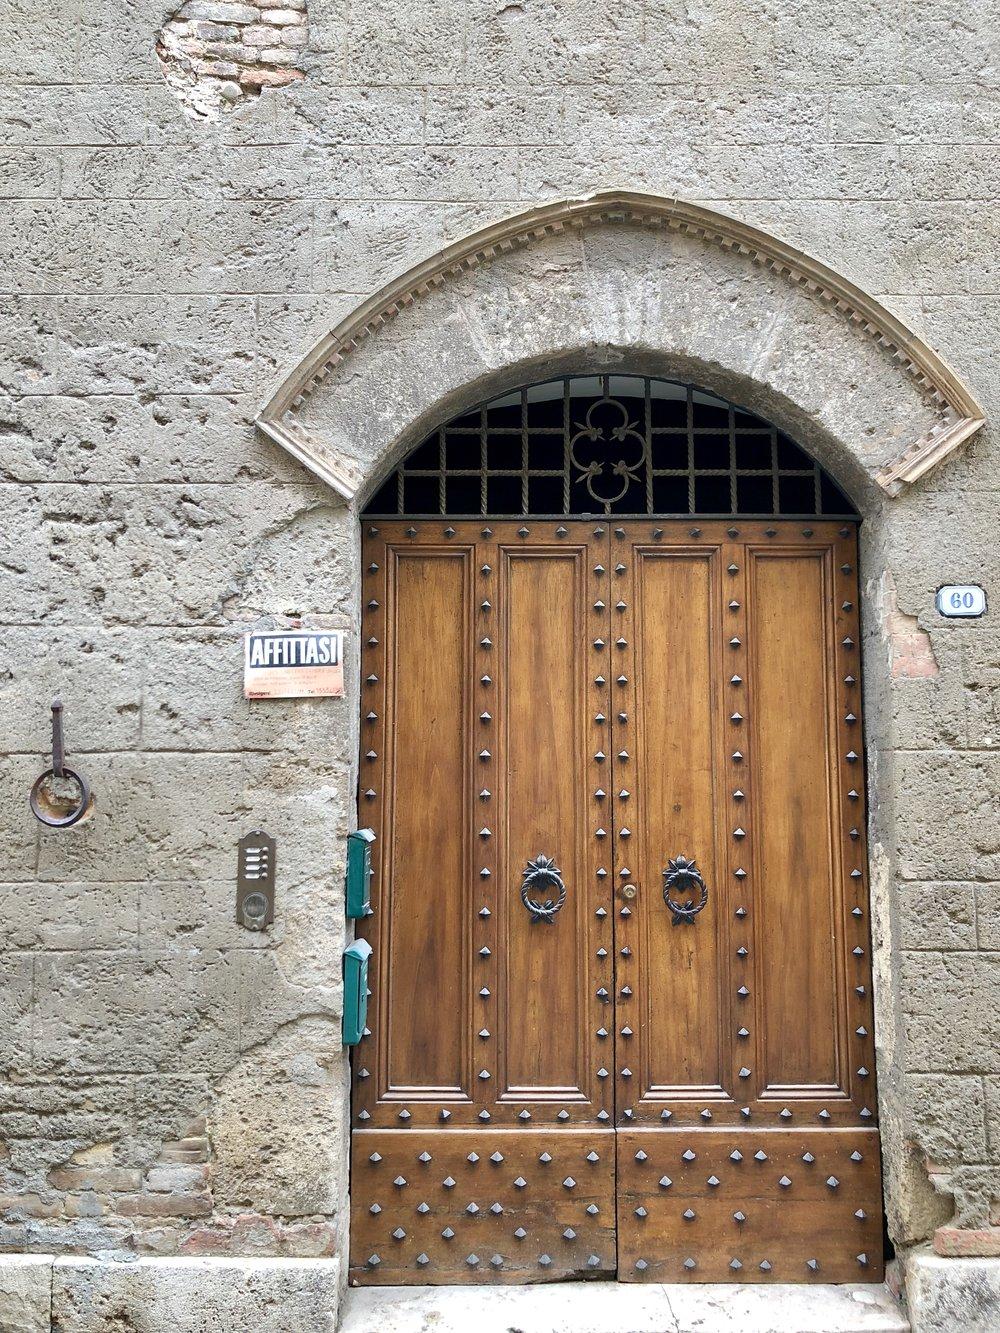 Main street in Chiusi: so many cool doors!